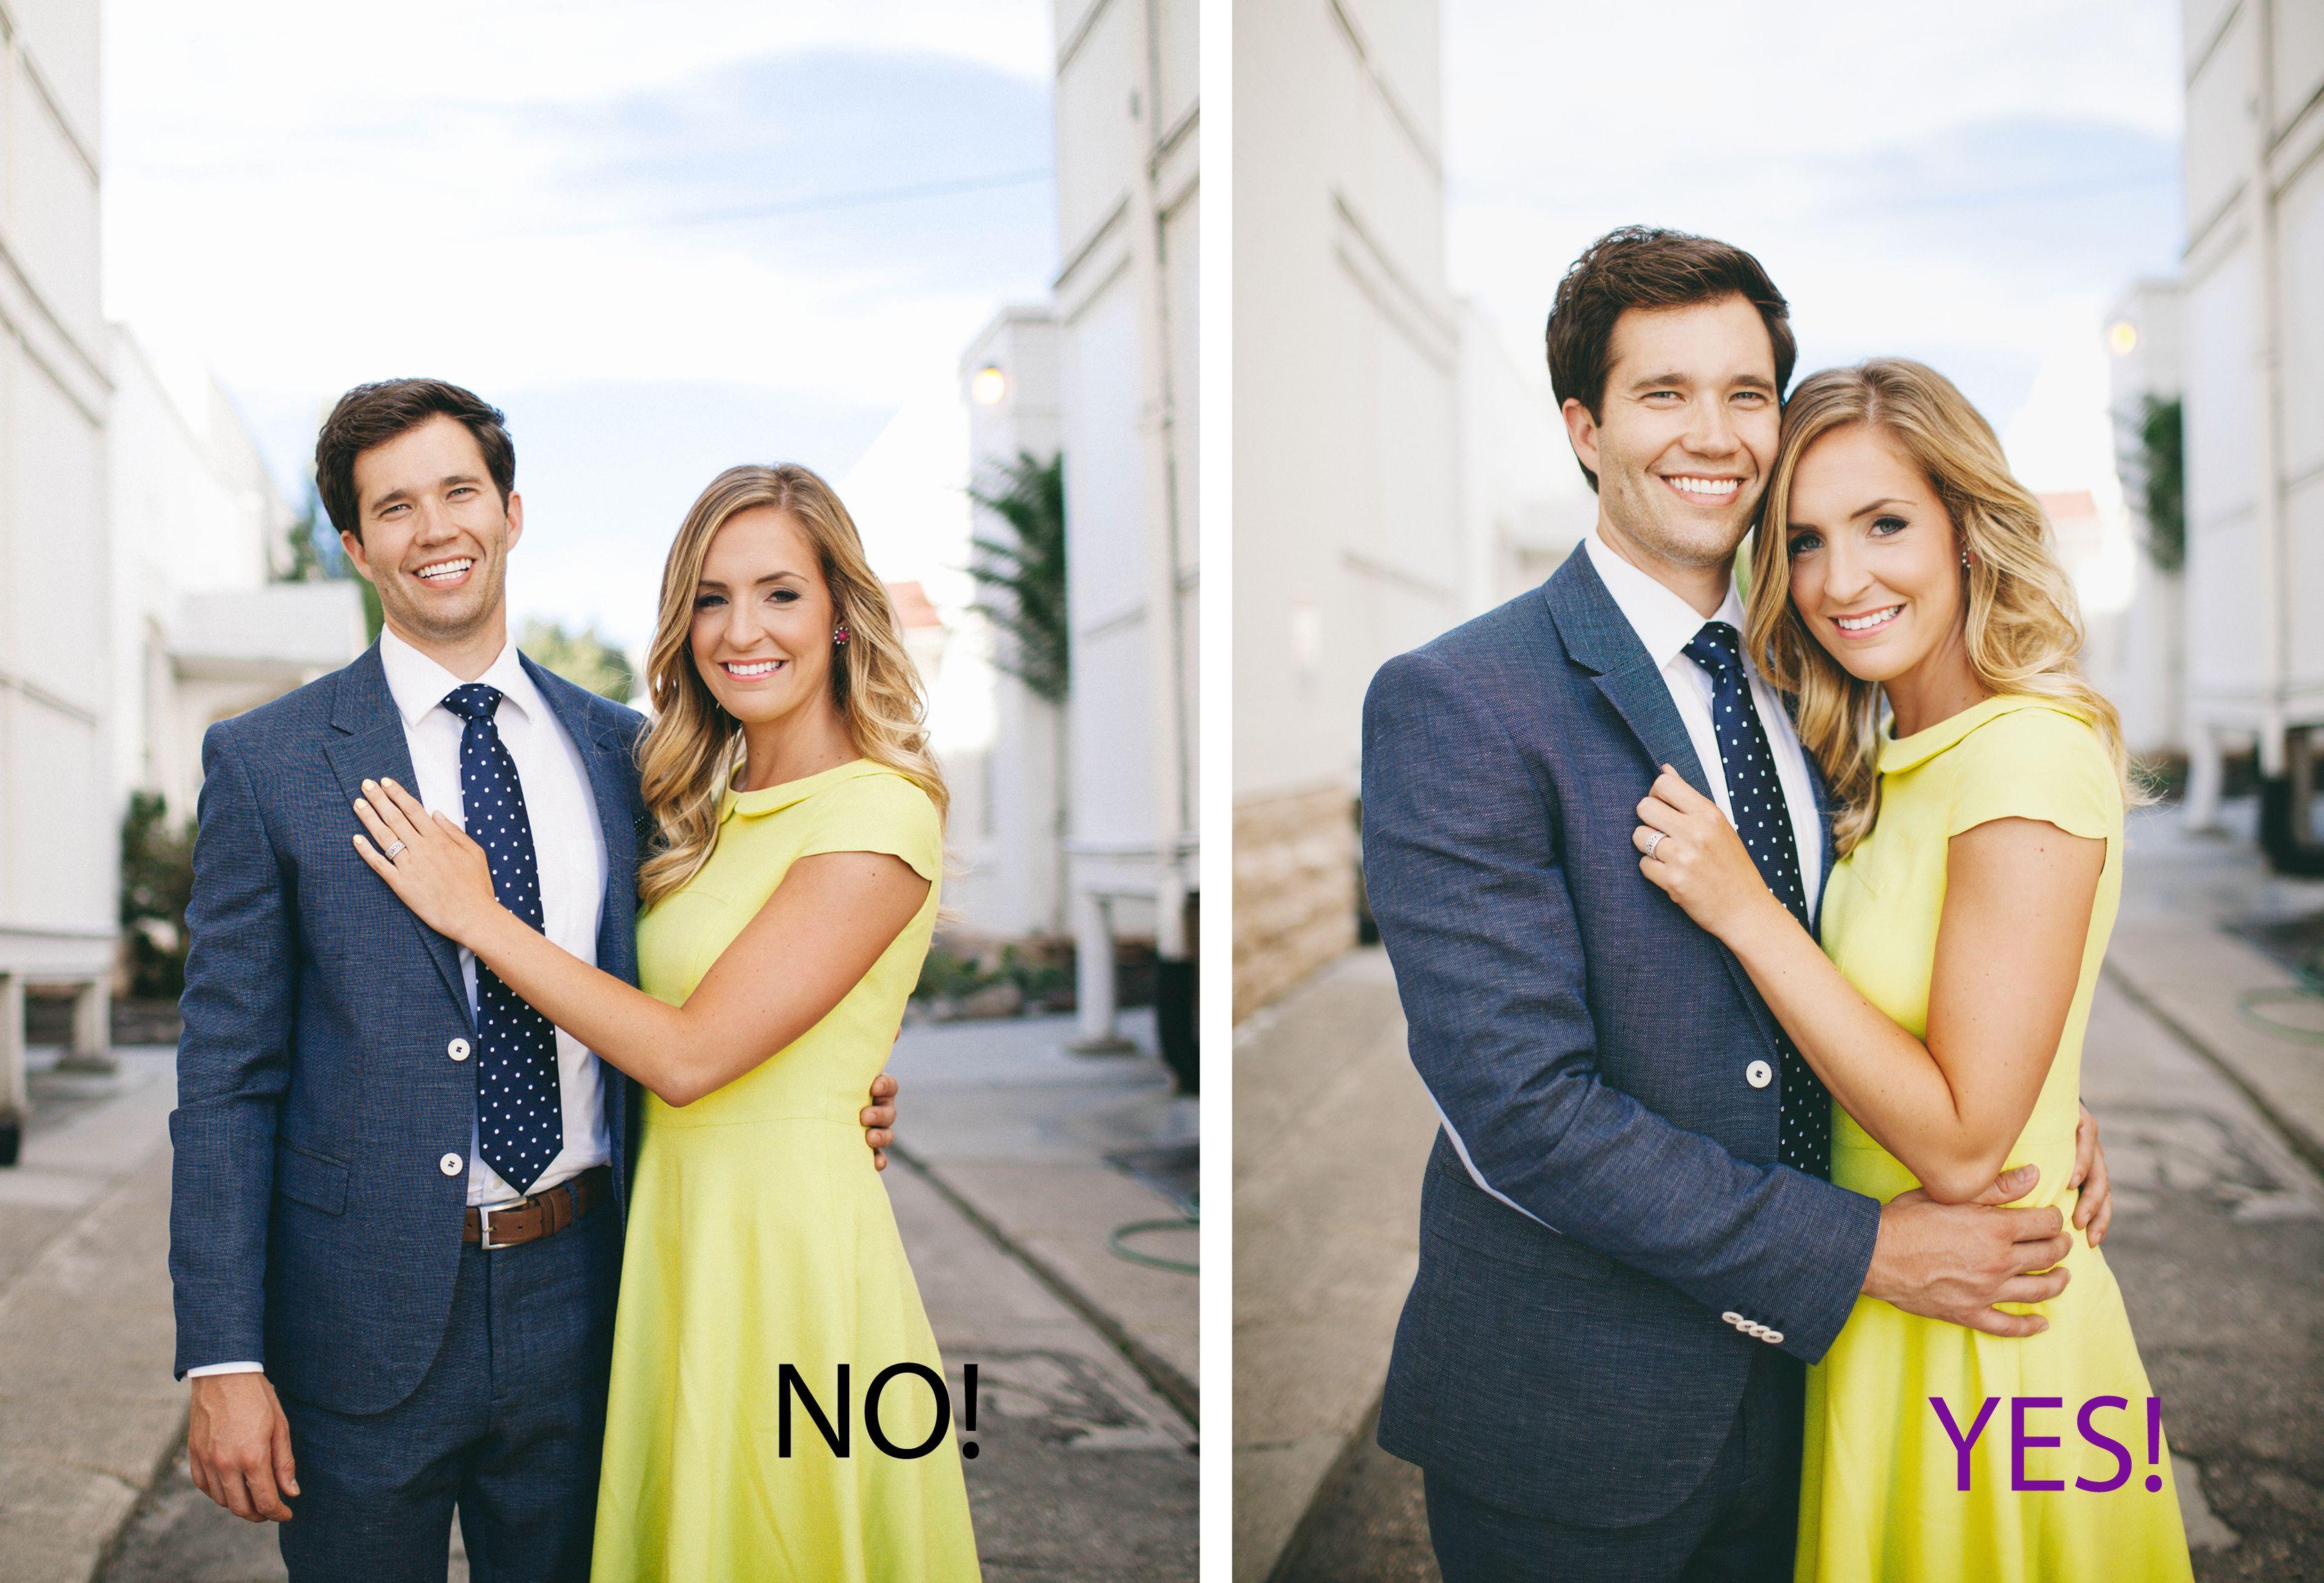 52006740aaac Do's & Don'ts for Couple Photos: The Engagement Ring Picture #couplephotos  #engagementpictures